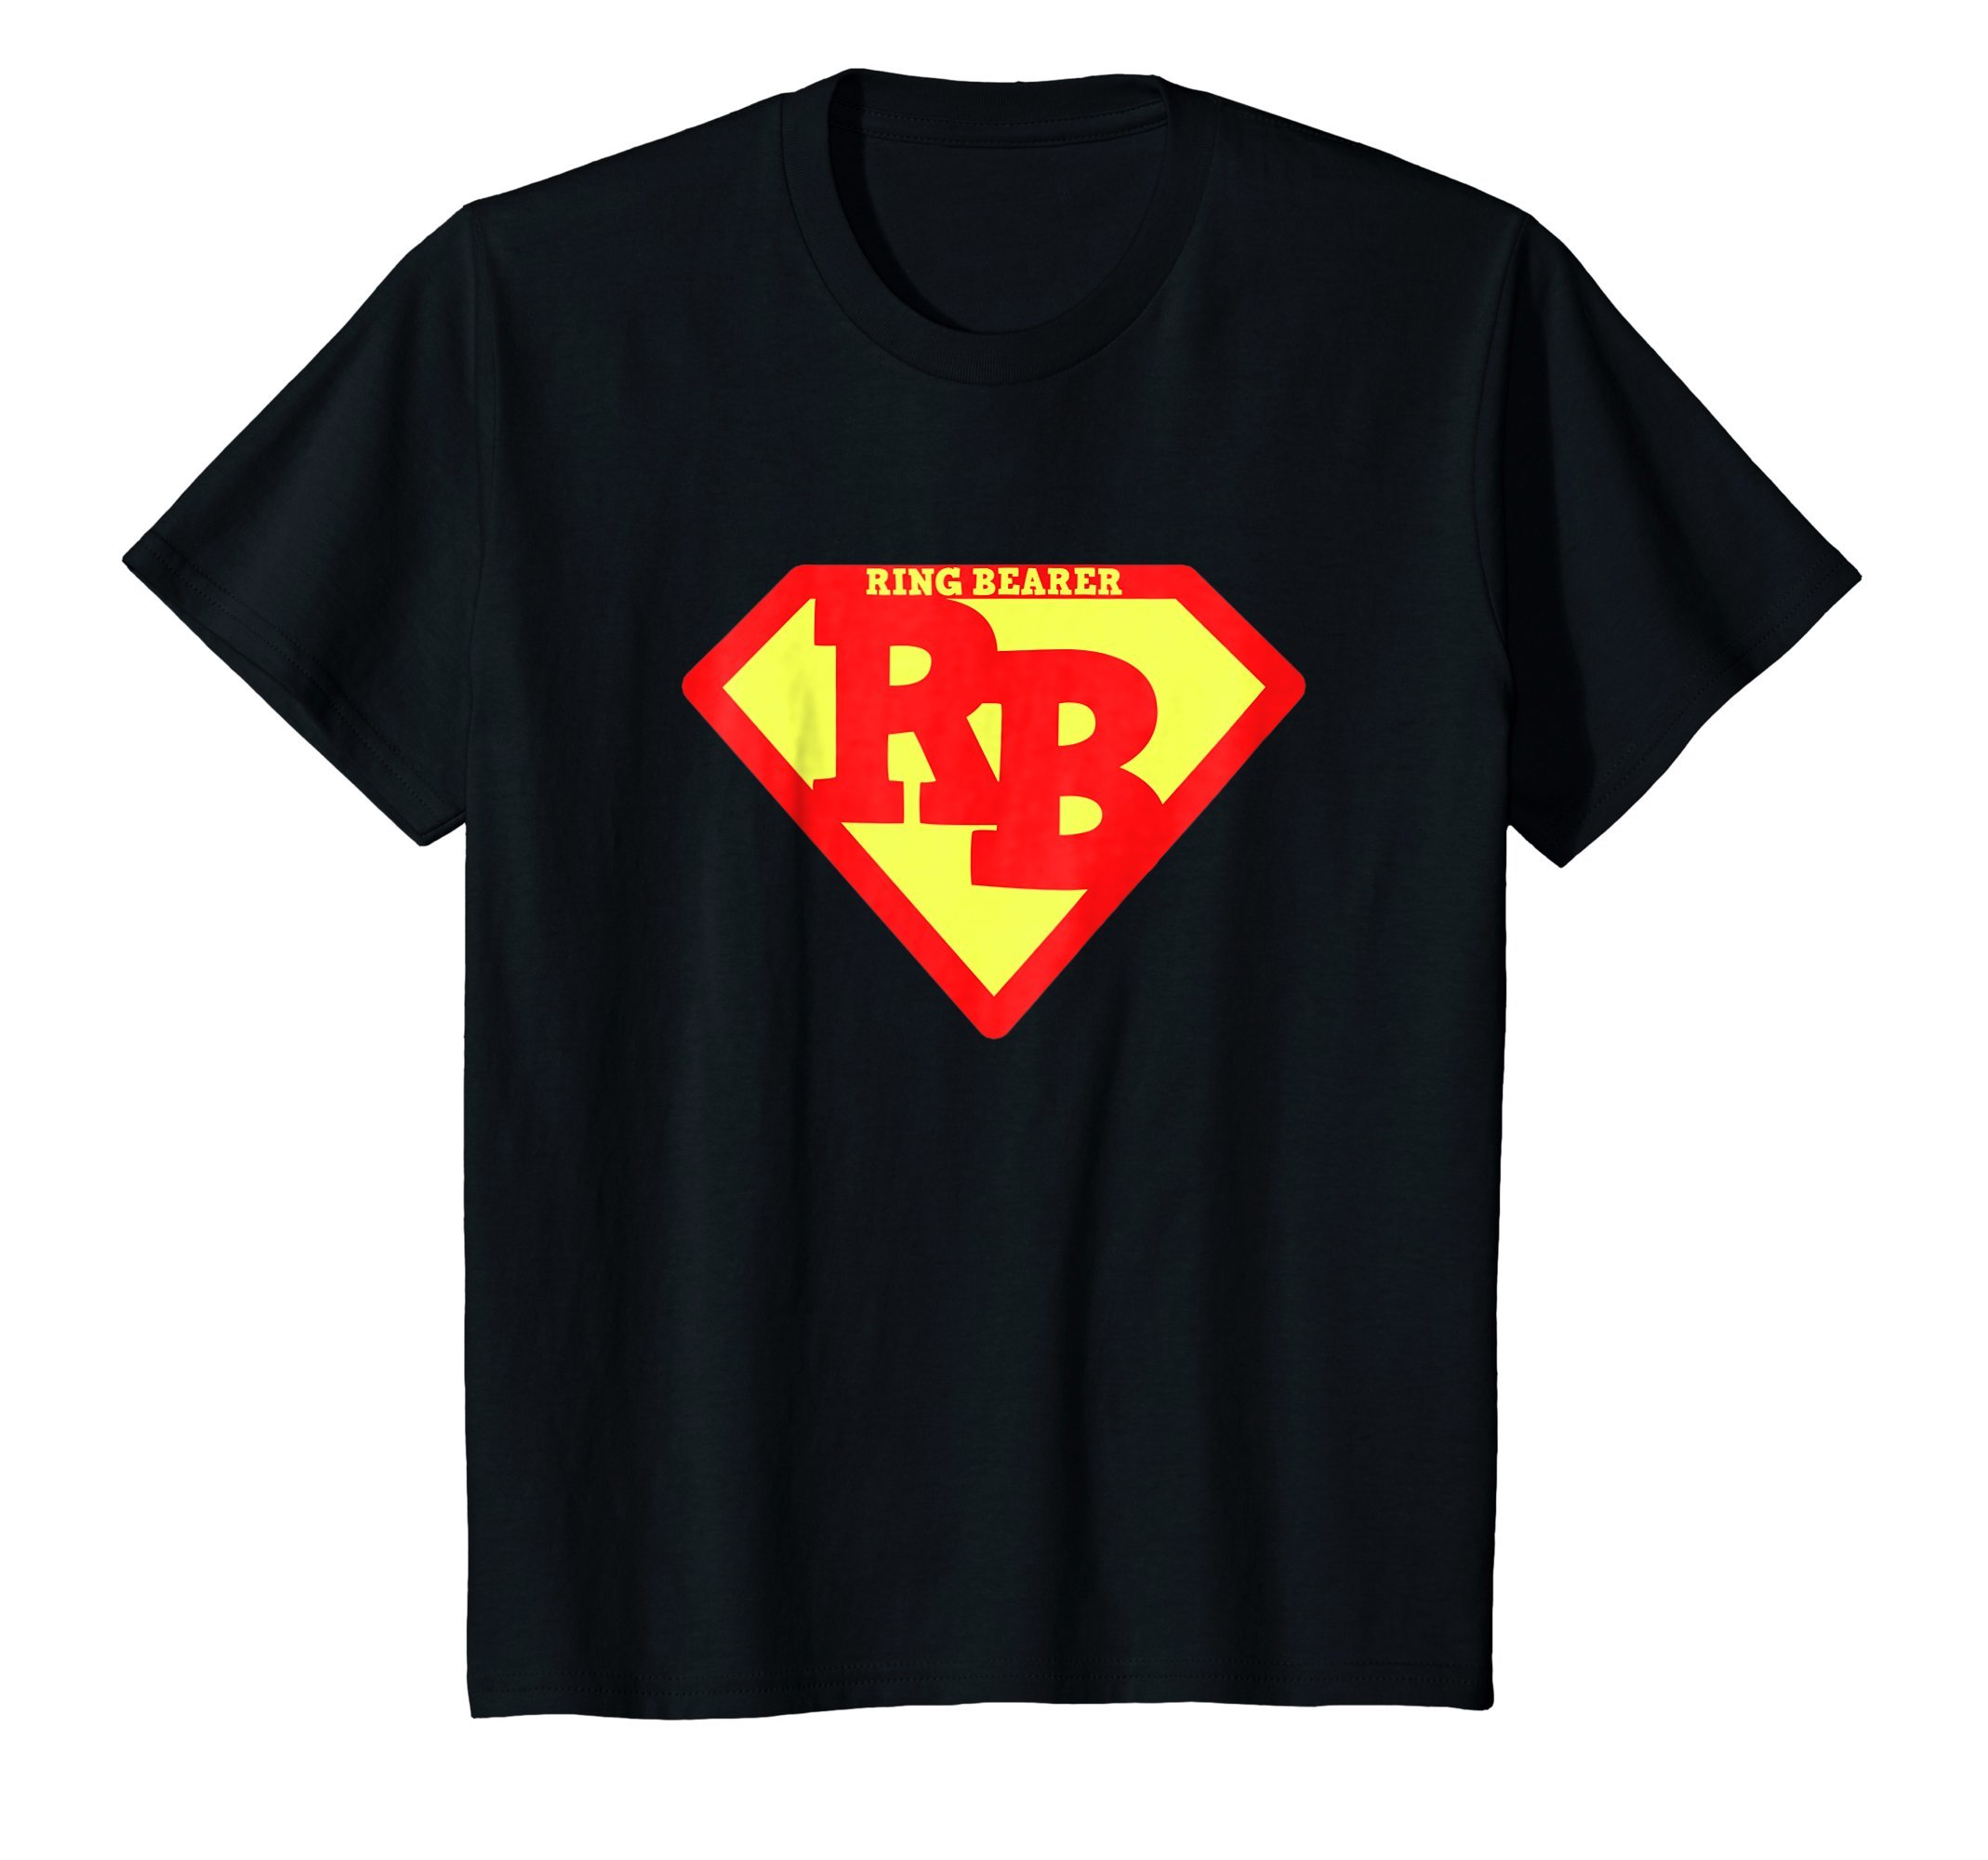 Kids Ring Bearer Super Cute Hero Shirt - Wedding Gift Tshirt 4 Black